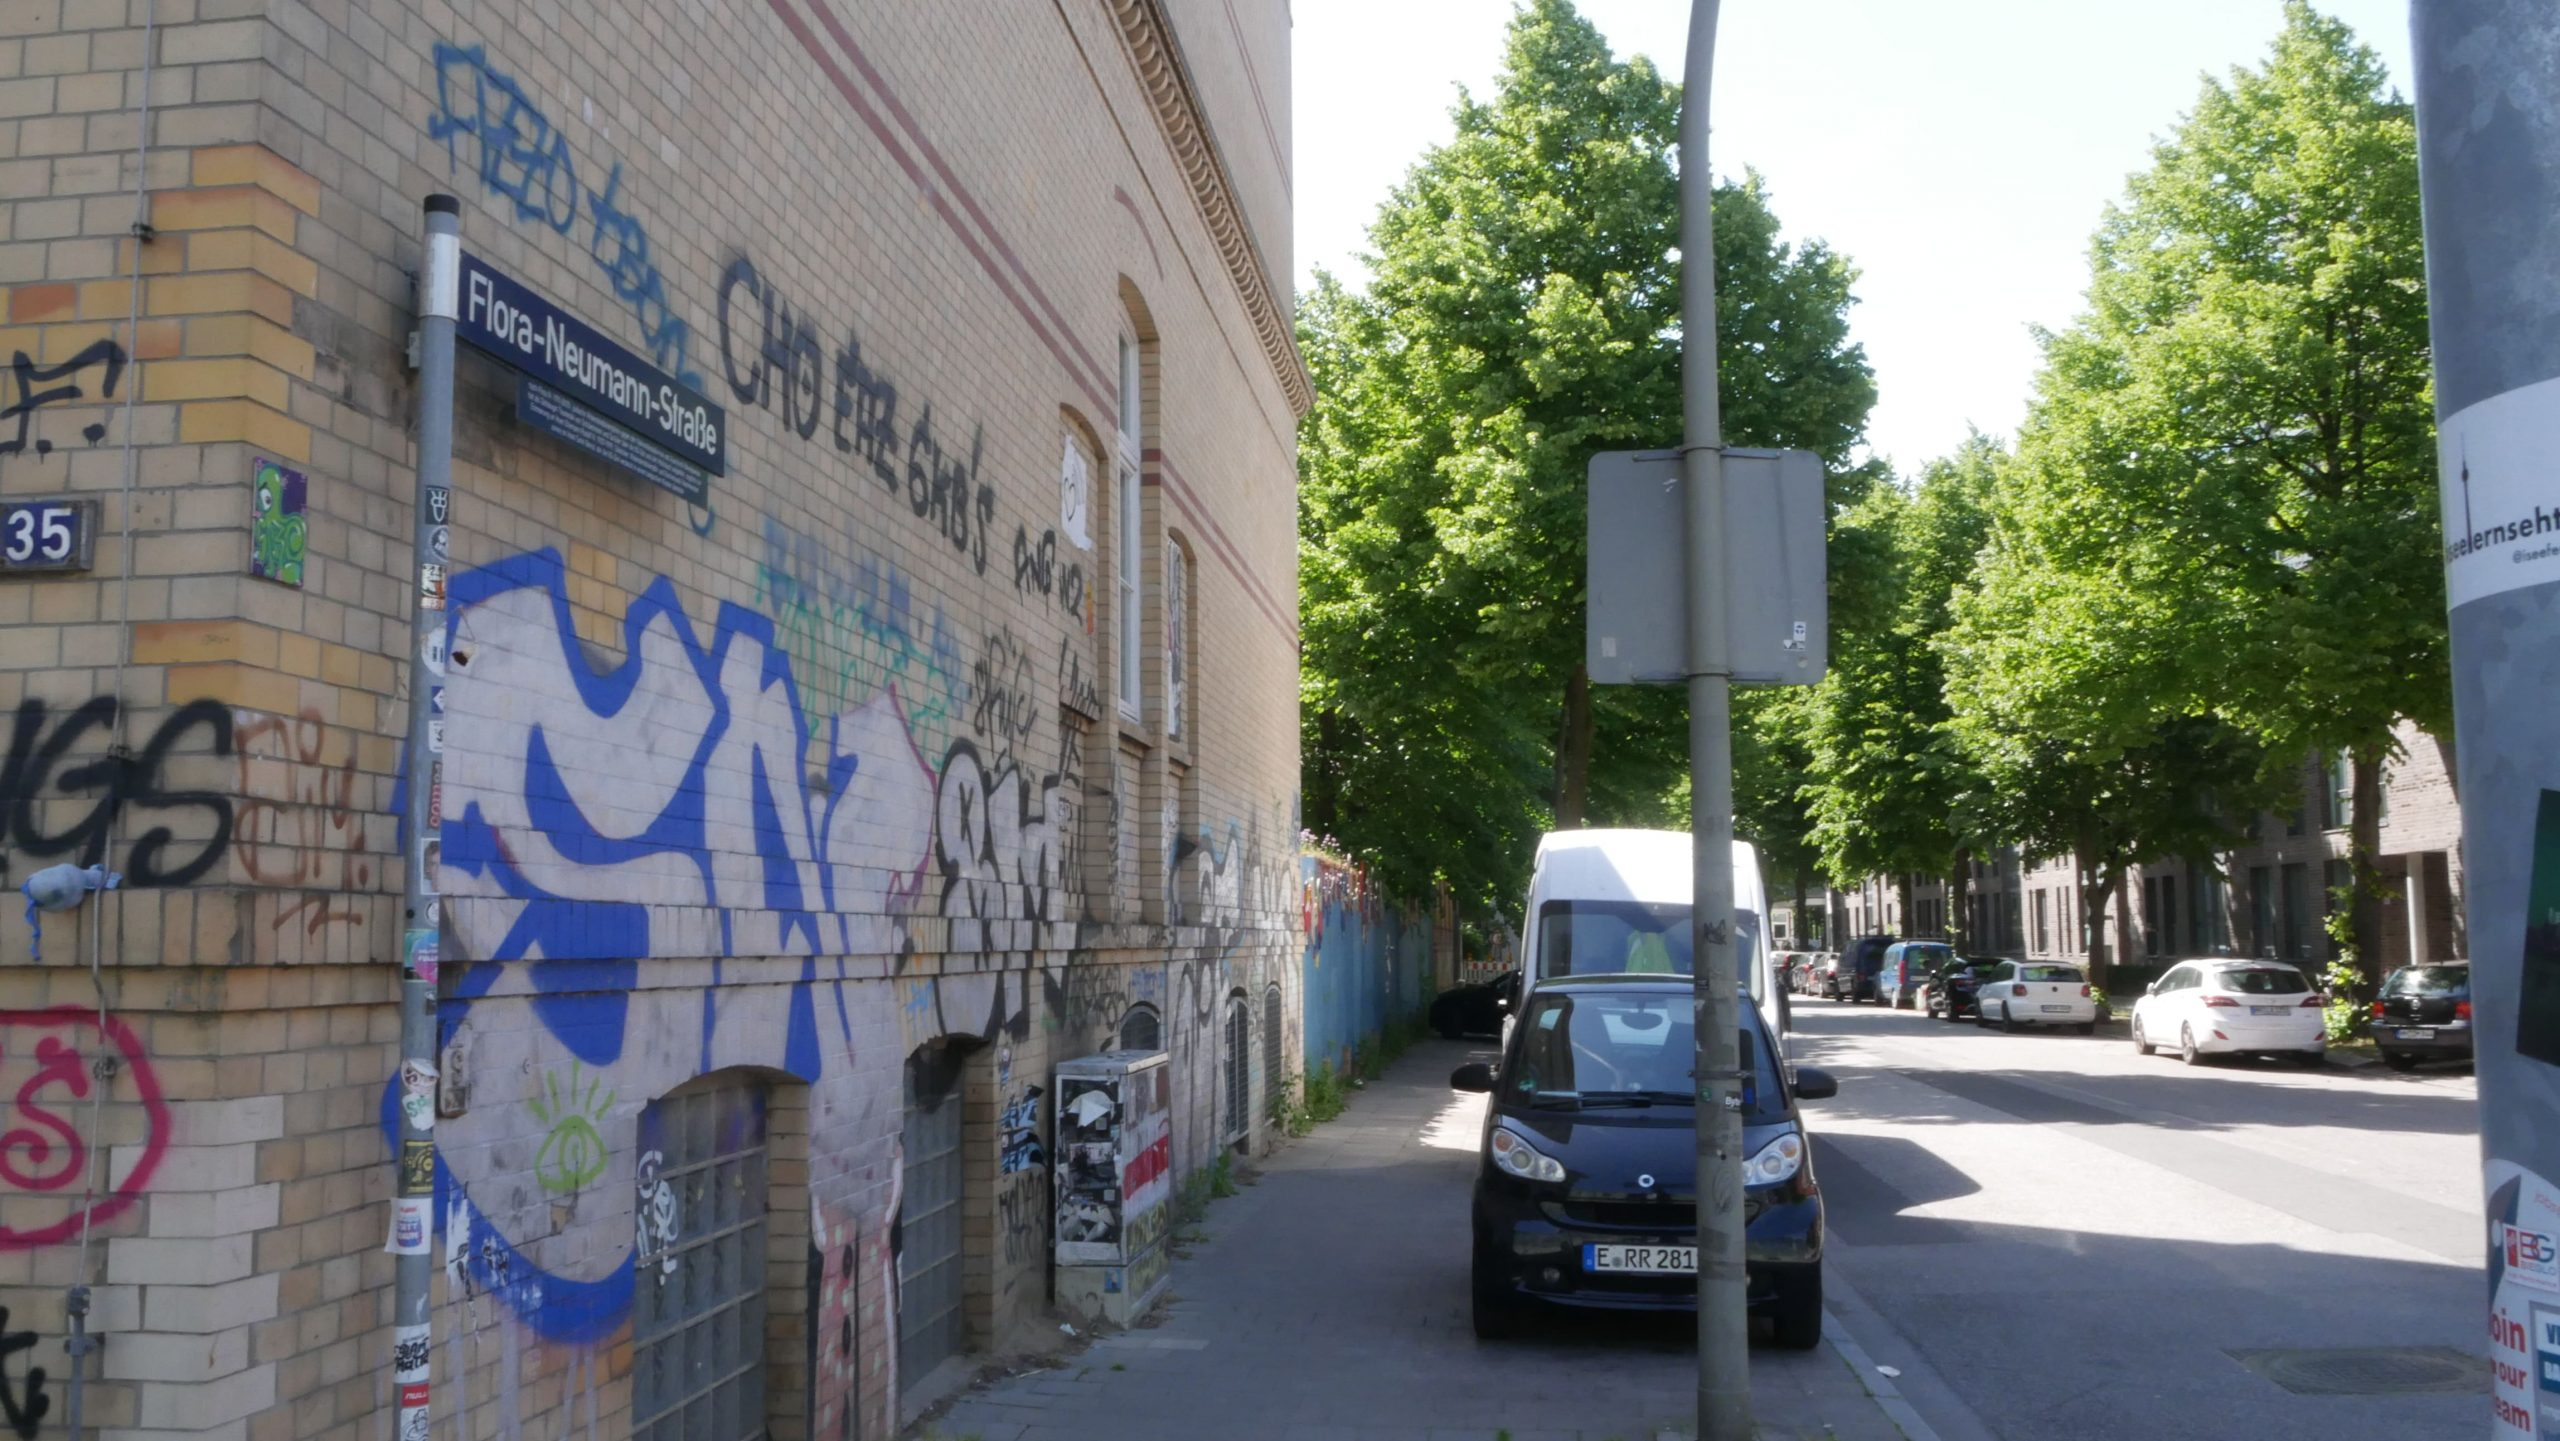 Flora Neumann Straße